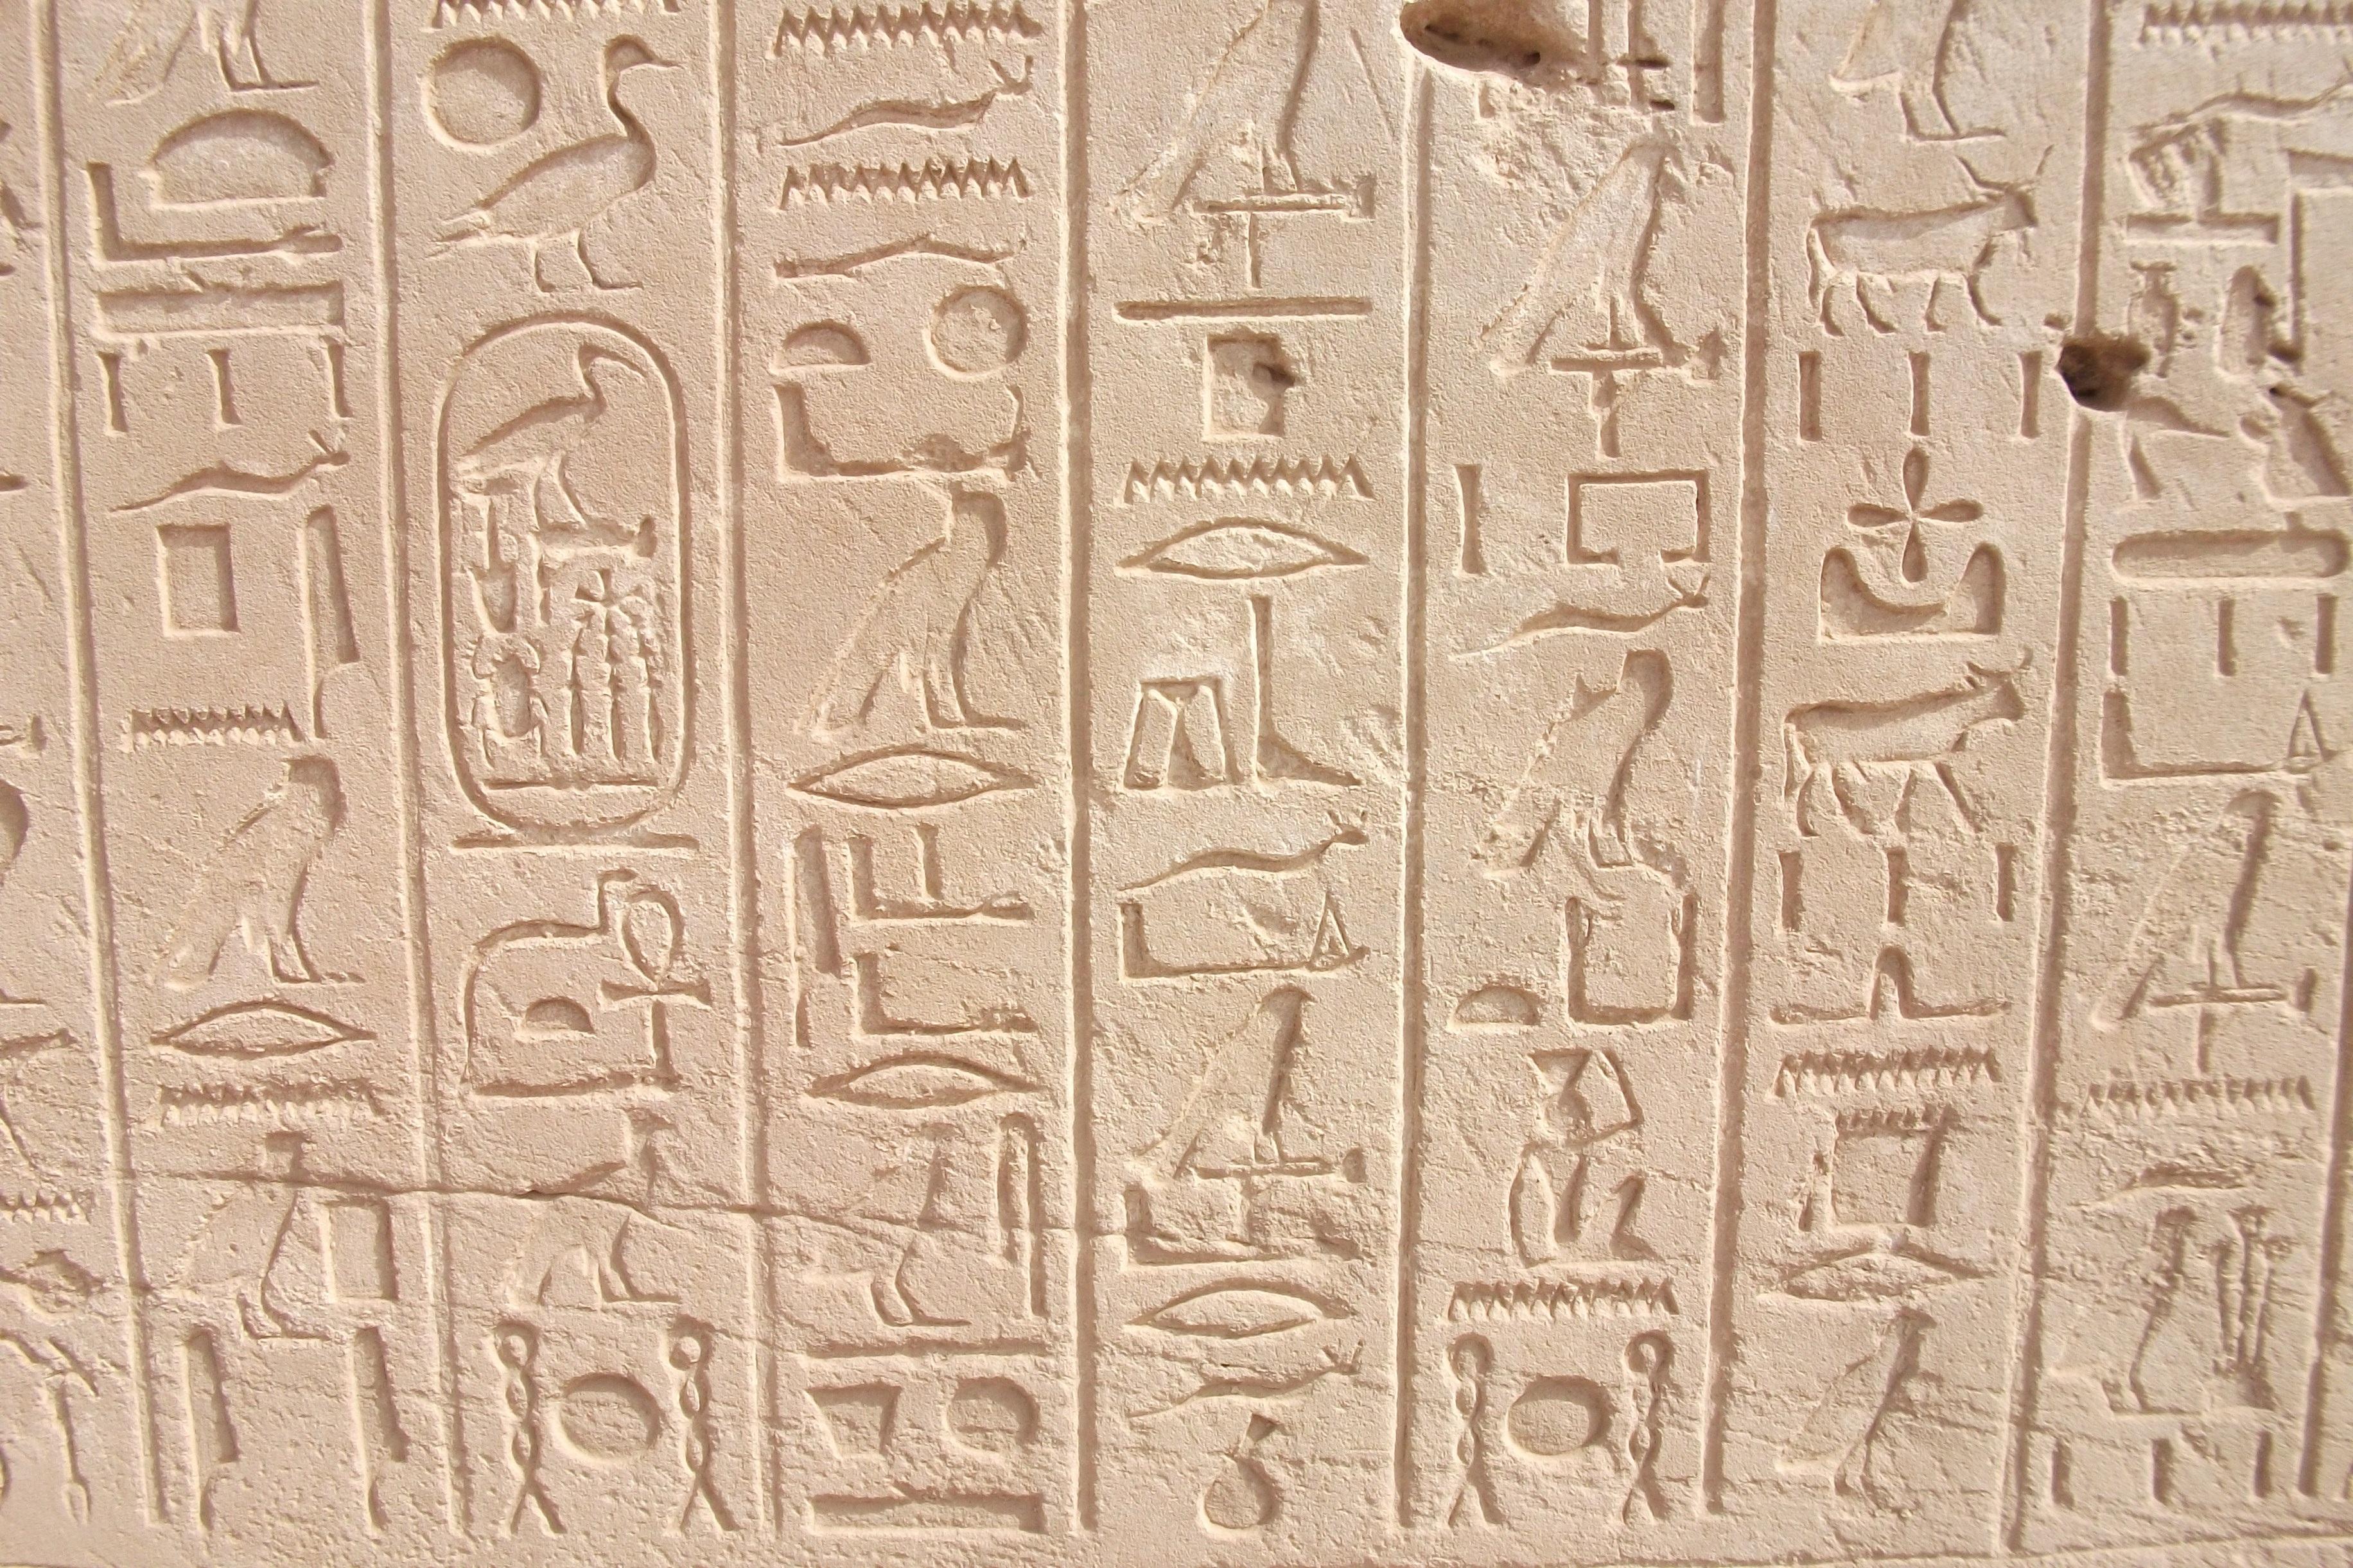 hieroglyphics-429863.jpg